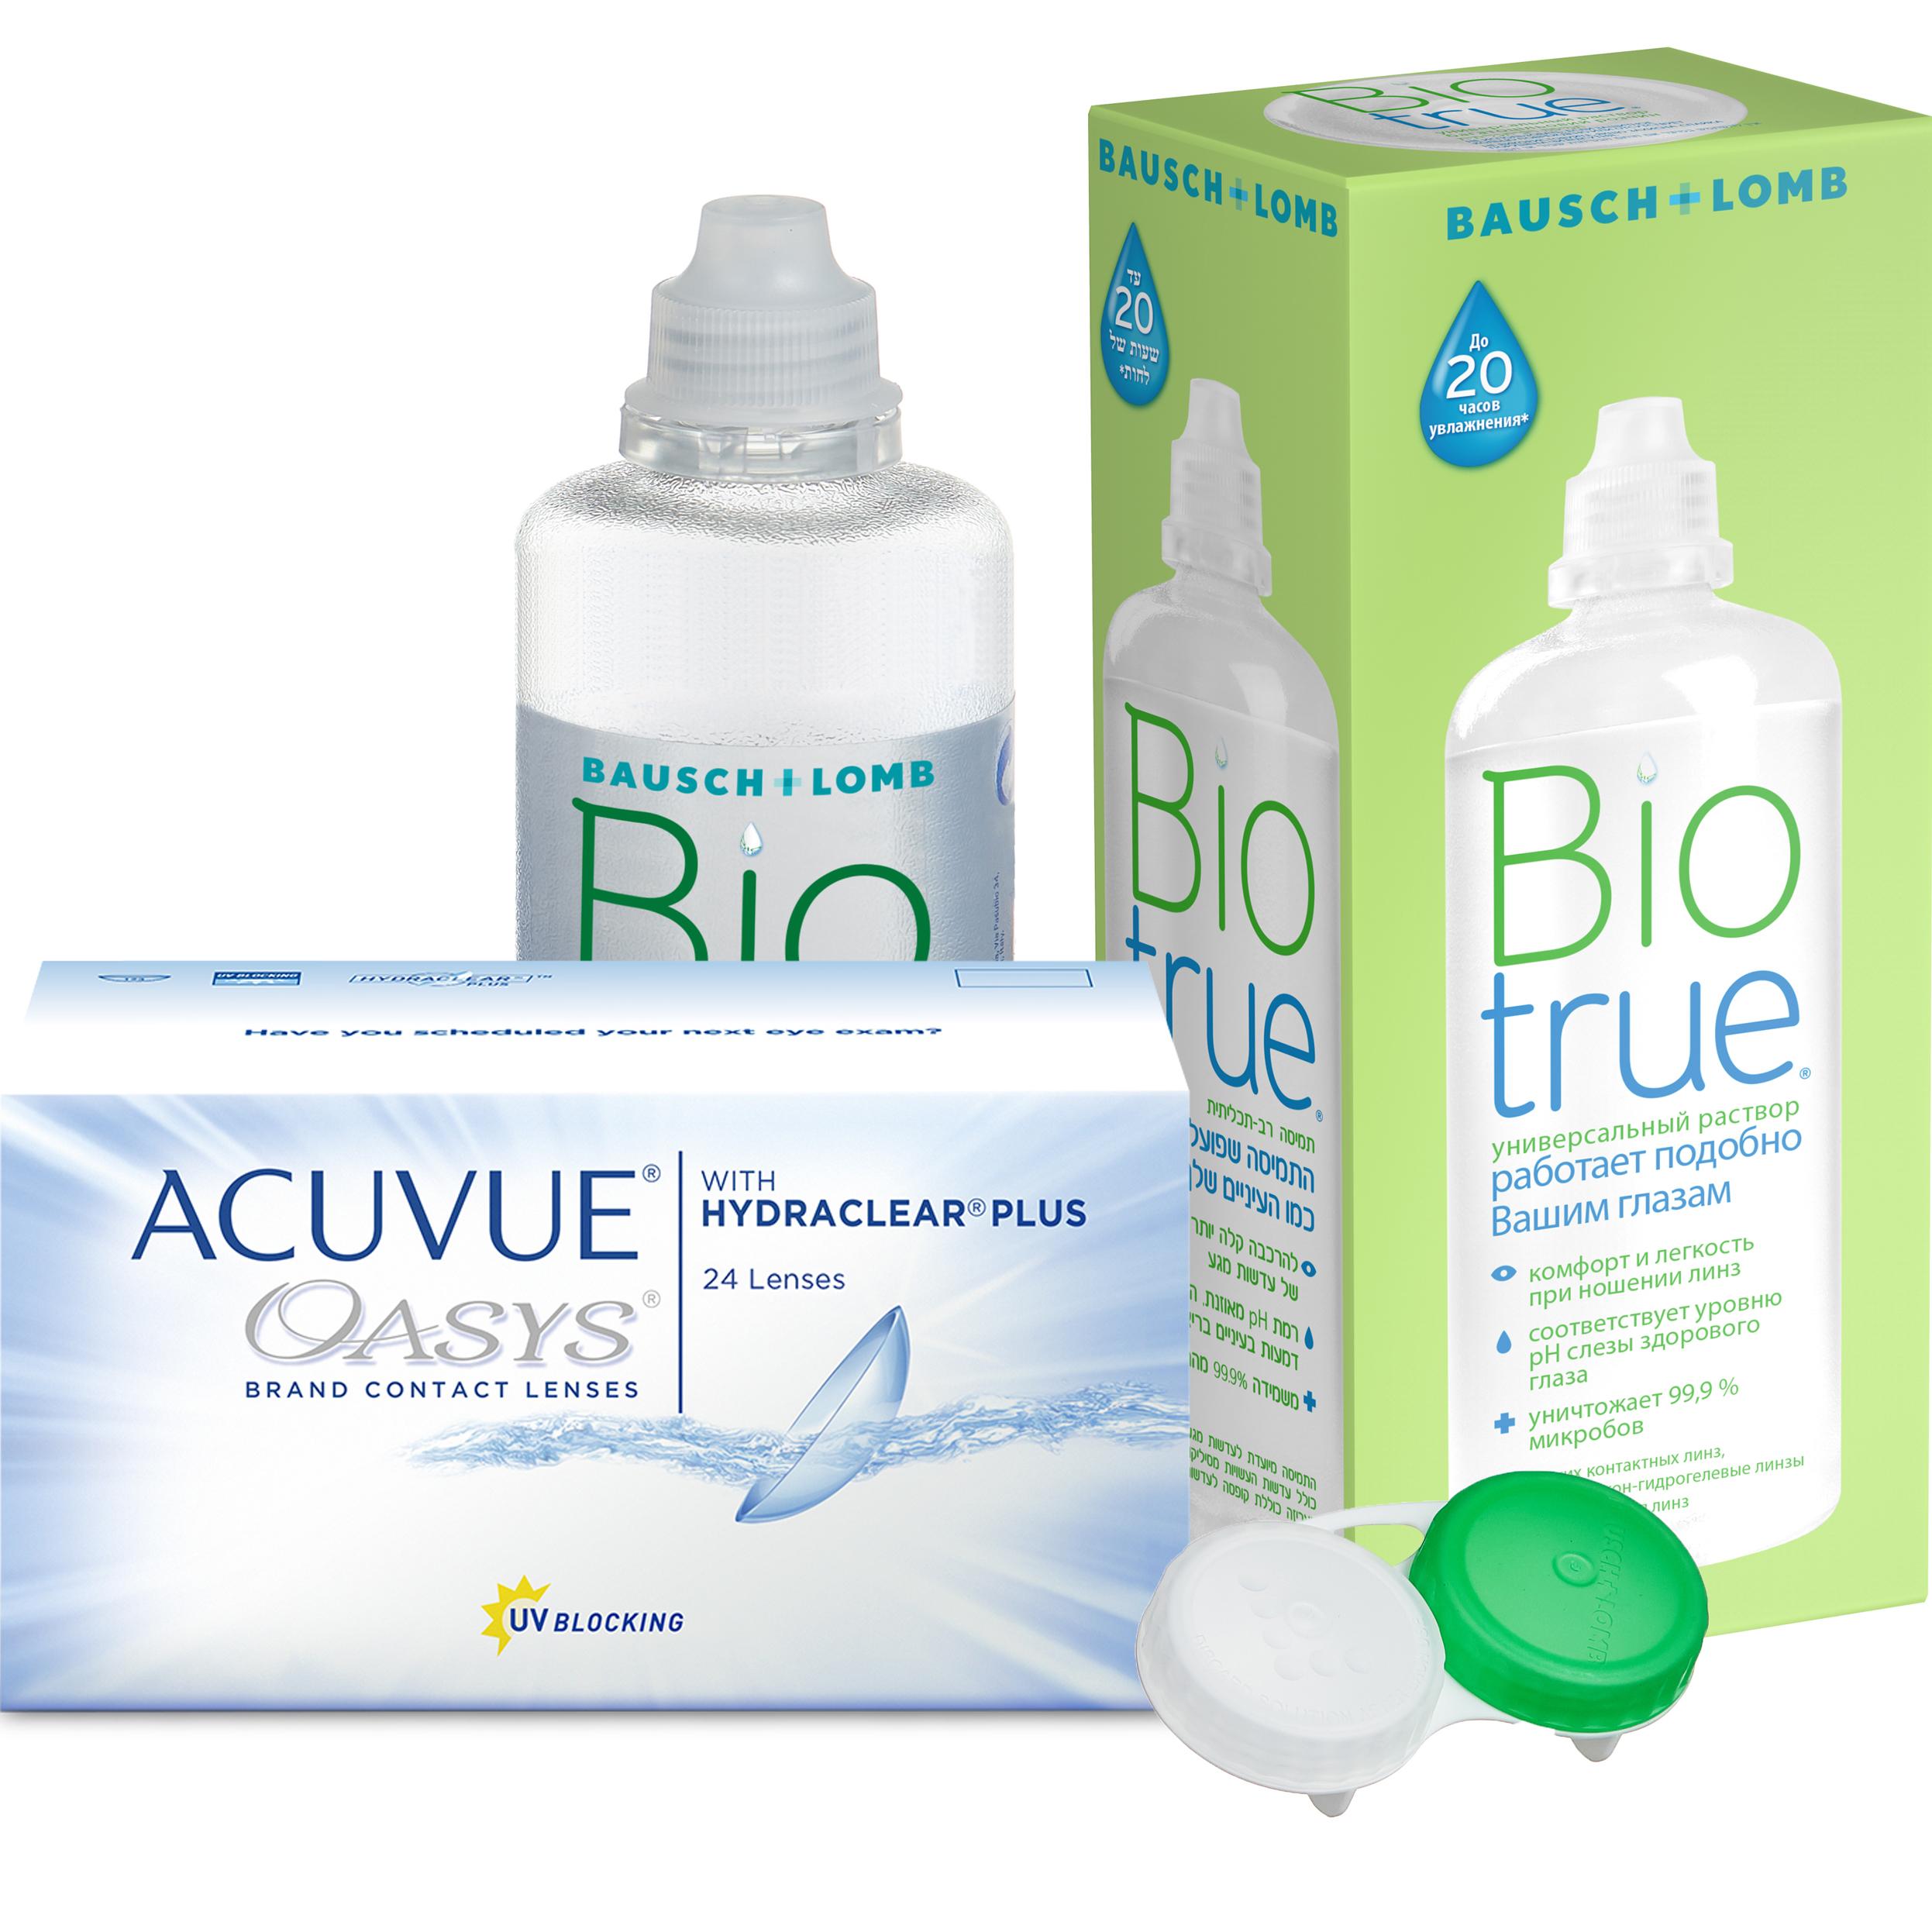 Купить Oasys with Hydraclear Plus 24 линзы + Biotrue, Контактные линзы Acuvue Oasys with Hydraclear Plus 24 линзы R 8.4 +6, 50 + Biotrue 300 мл